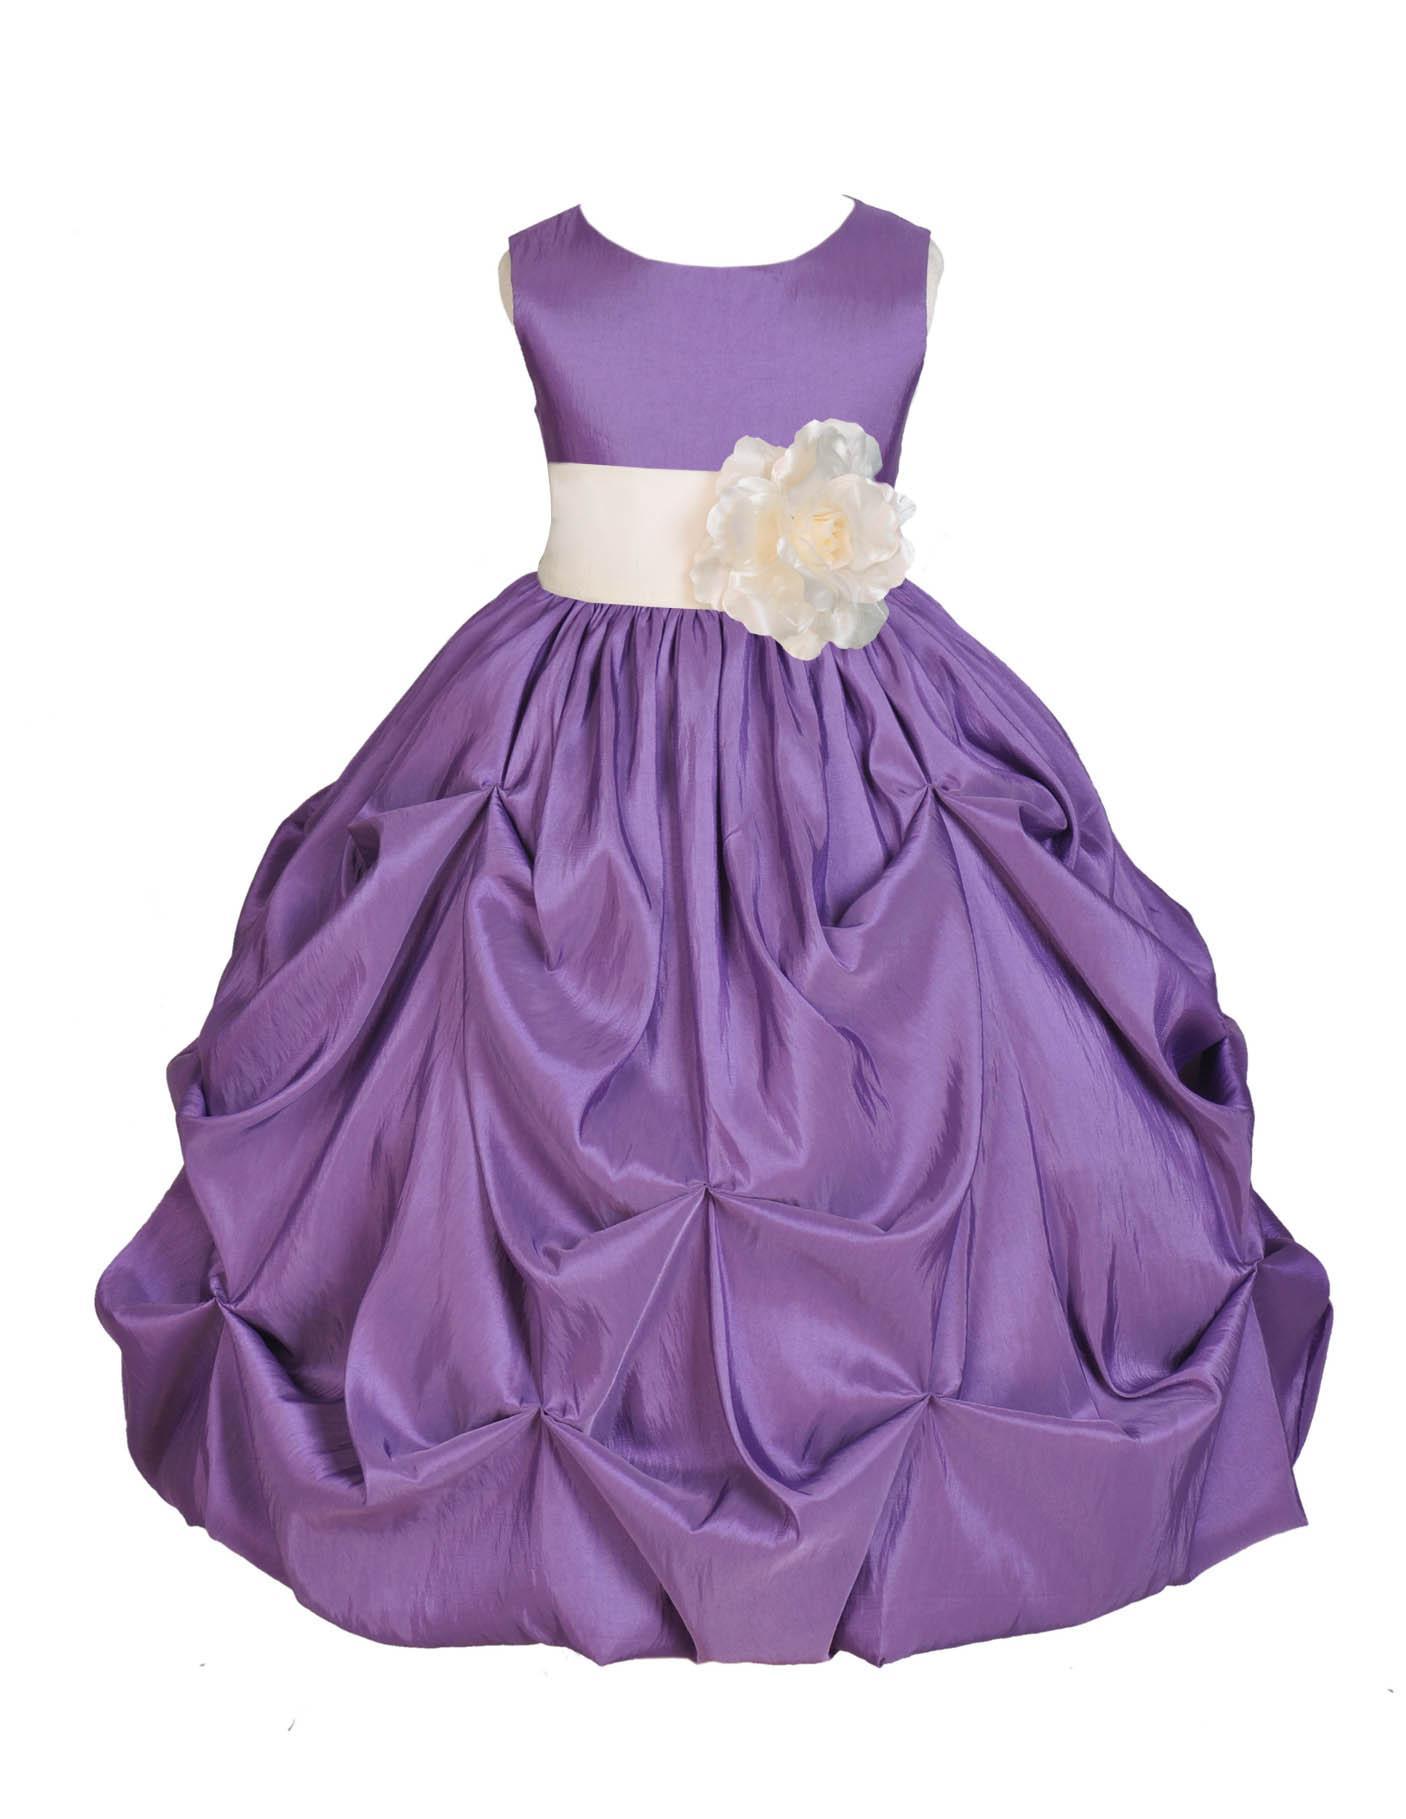 Ekidsbridal Purple Bubble Pick-up Taffeta Flower Girl Dress Christmas Bridesmaid Wedding Pageant Toddler Recital Easter Holiday Communion Birthday Baptism Occasions 301s